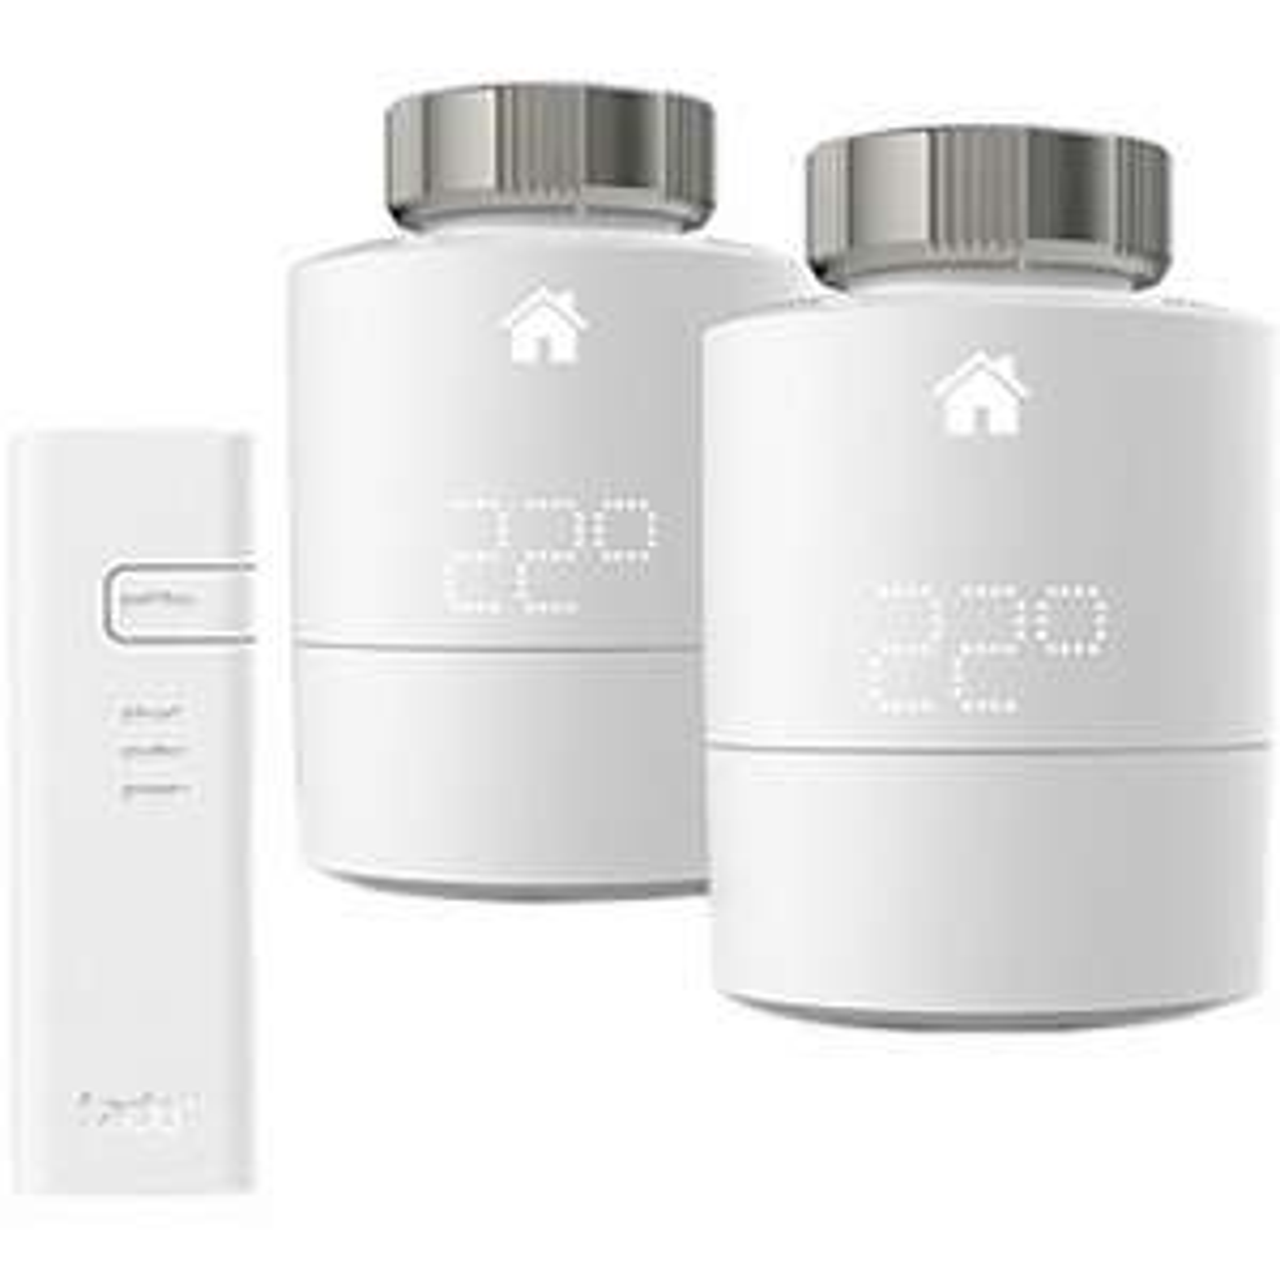 tado 101916 Smart Radiator Thermostat Starter Kit - Horizontal v3 for £71.20 delivered @ AO eBay